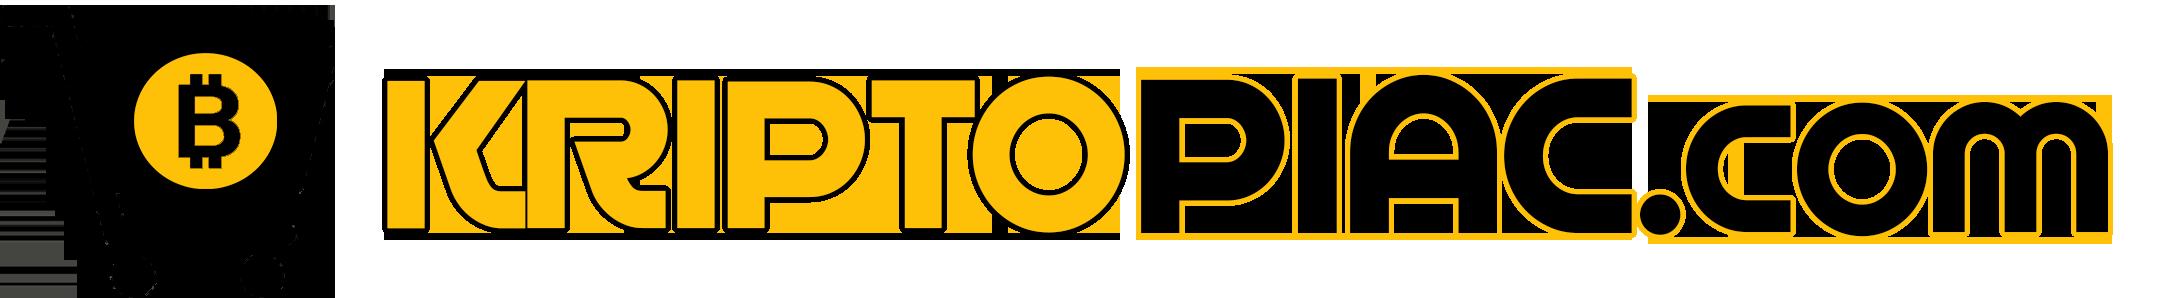 kriptopiac.com